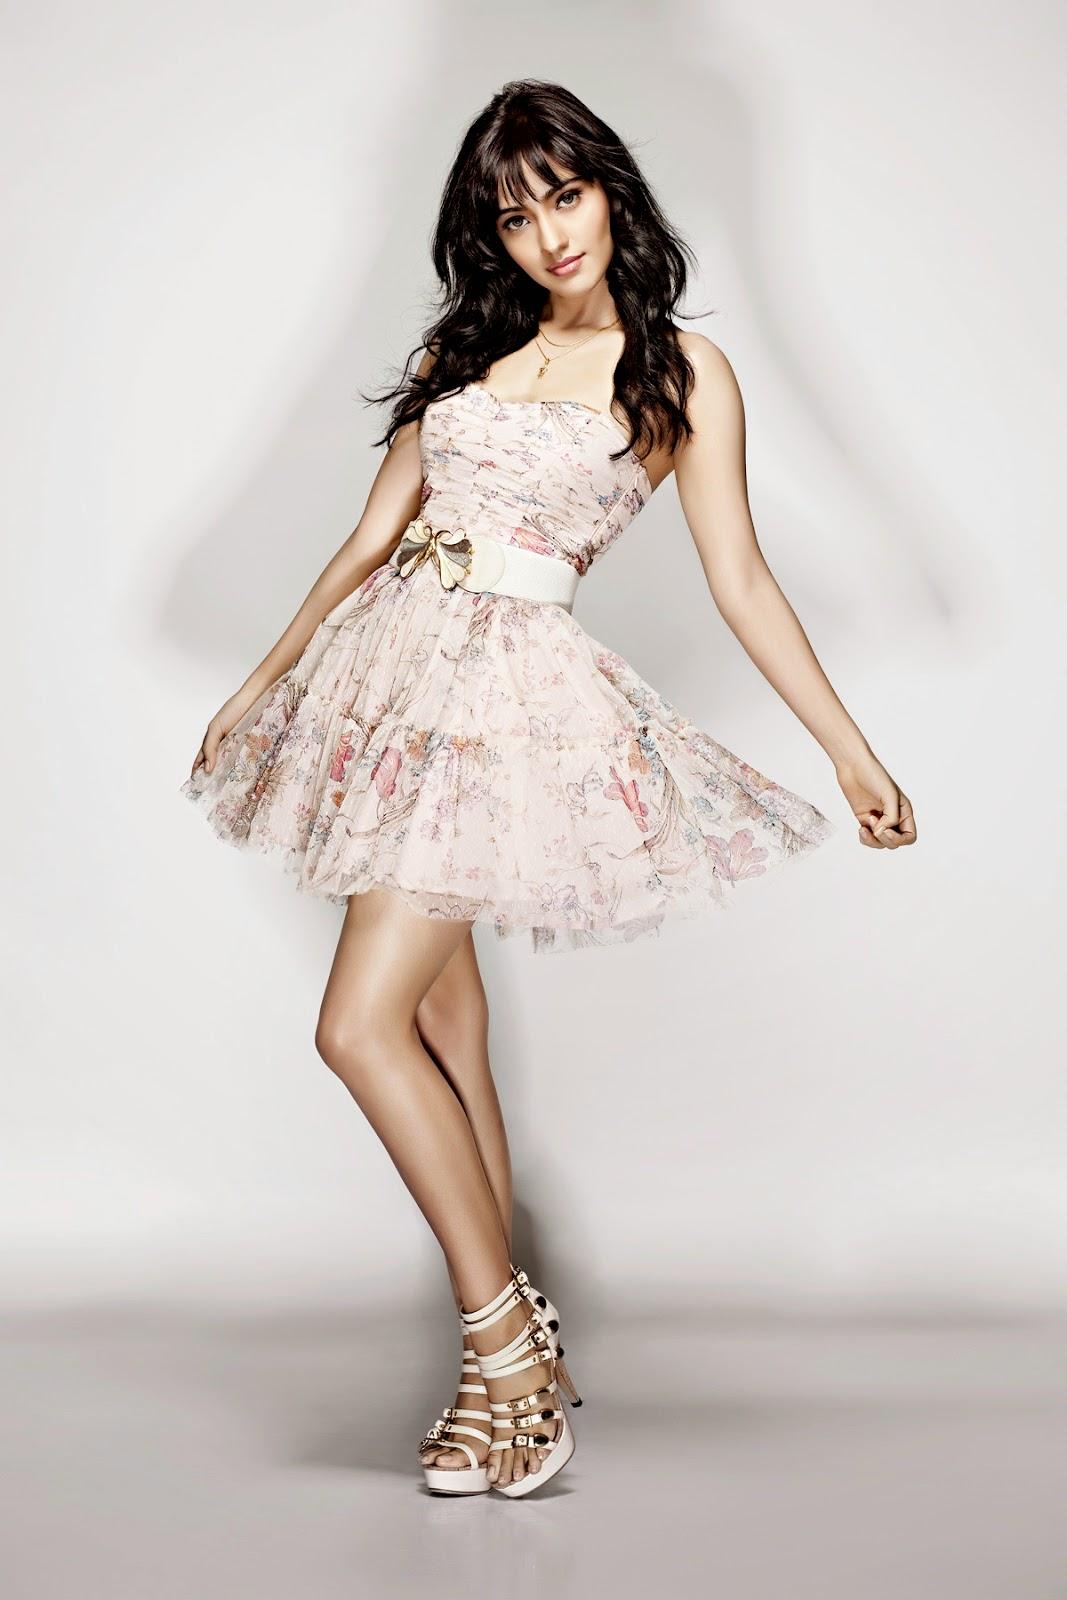 Neha Sharma in a Sexy Strapless Mini-dress